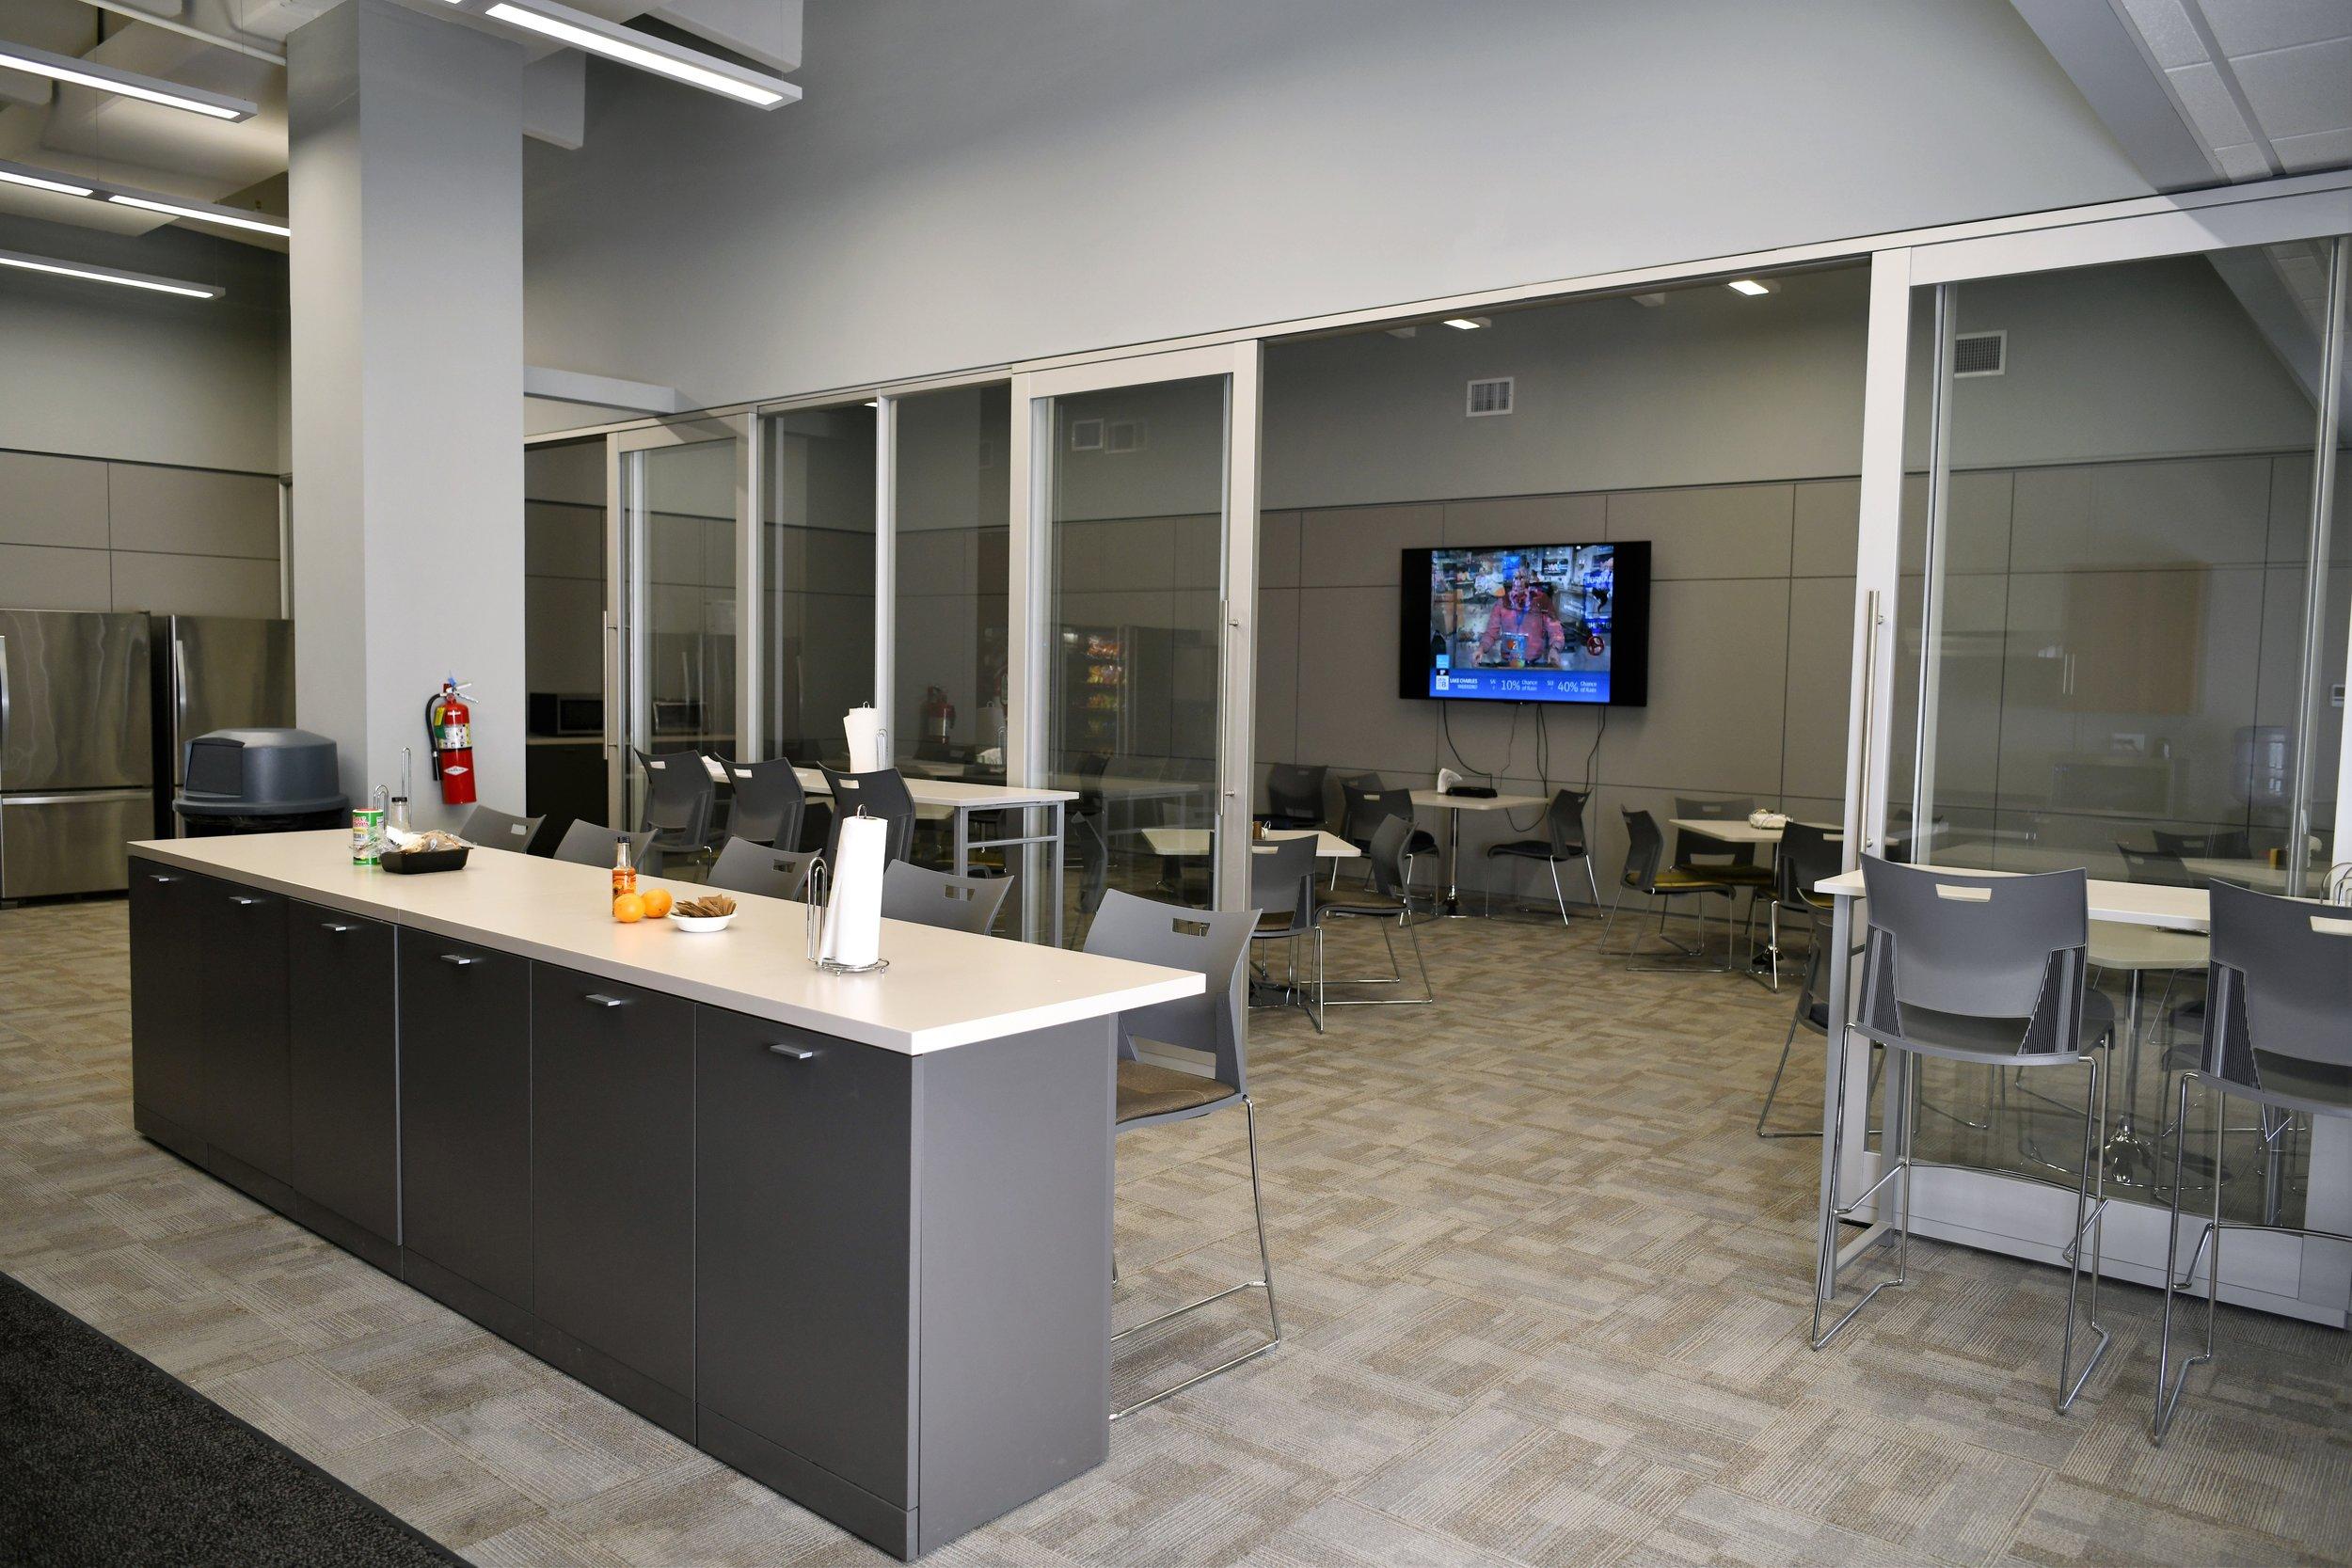 20 Interior Break Room Exposed Double T.jpg